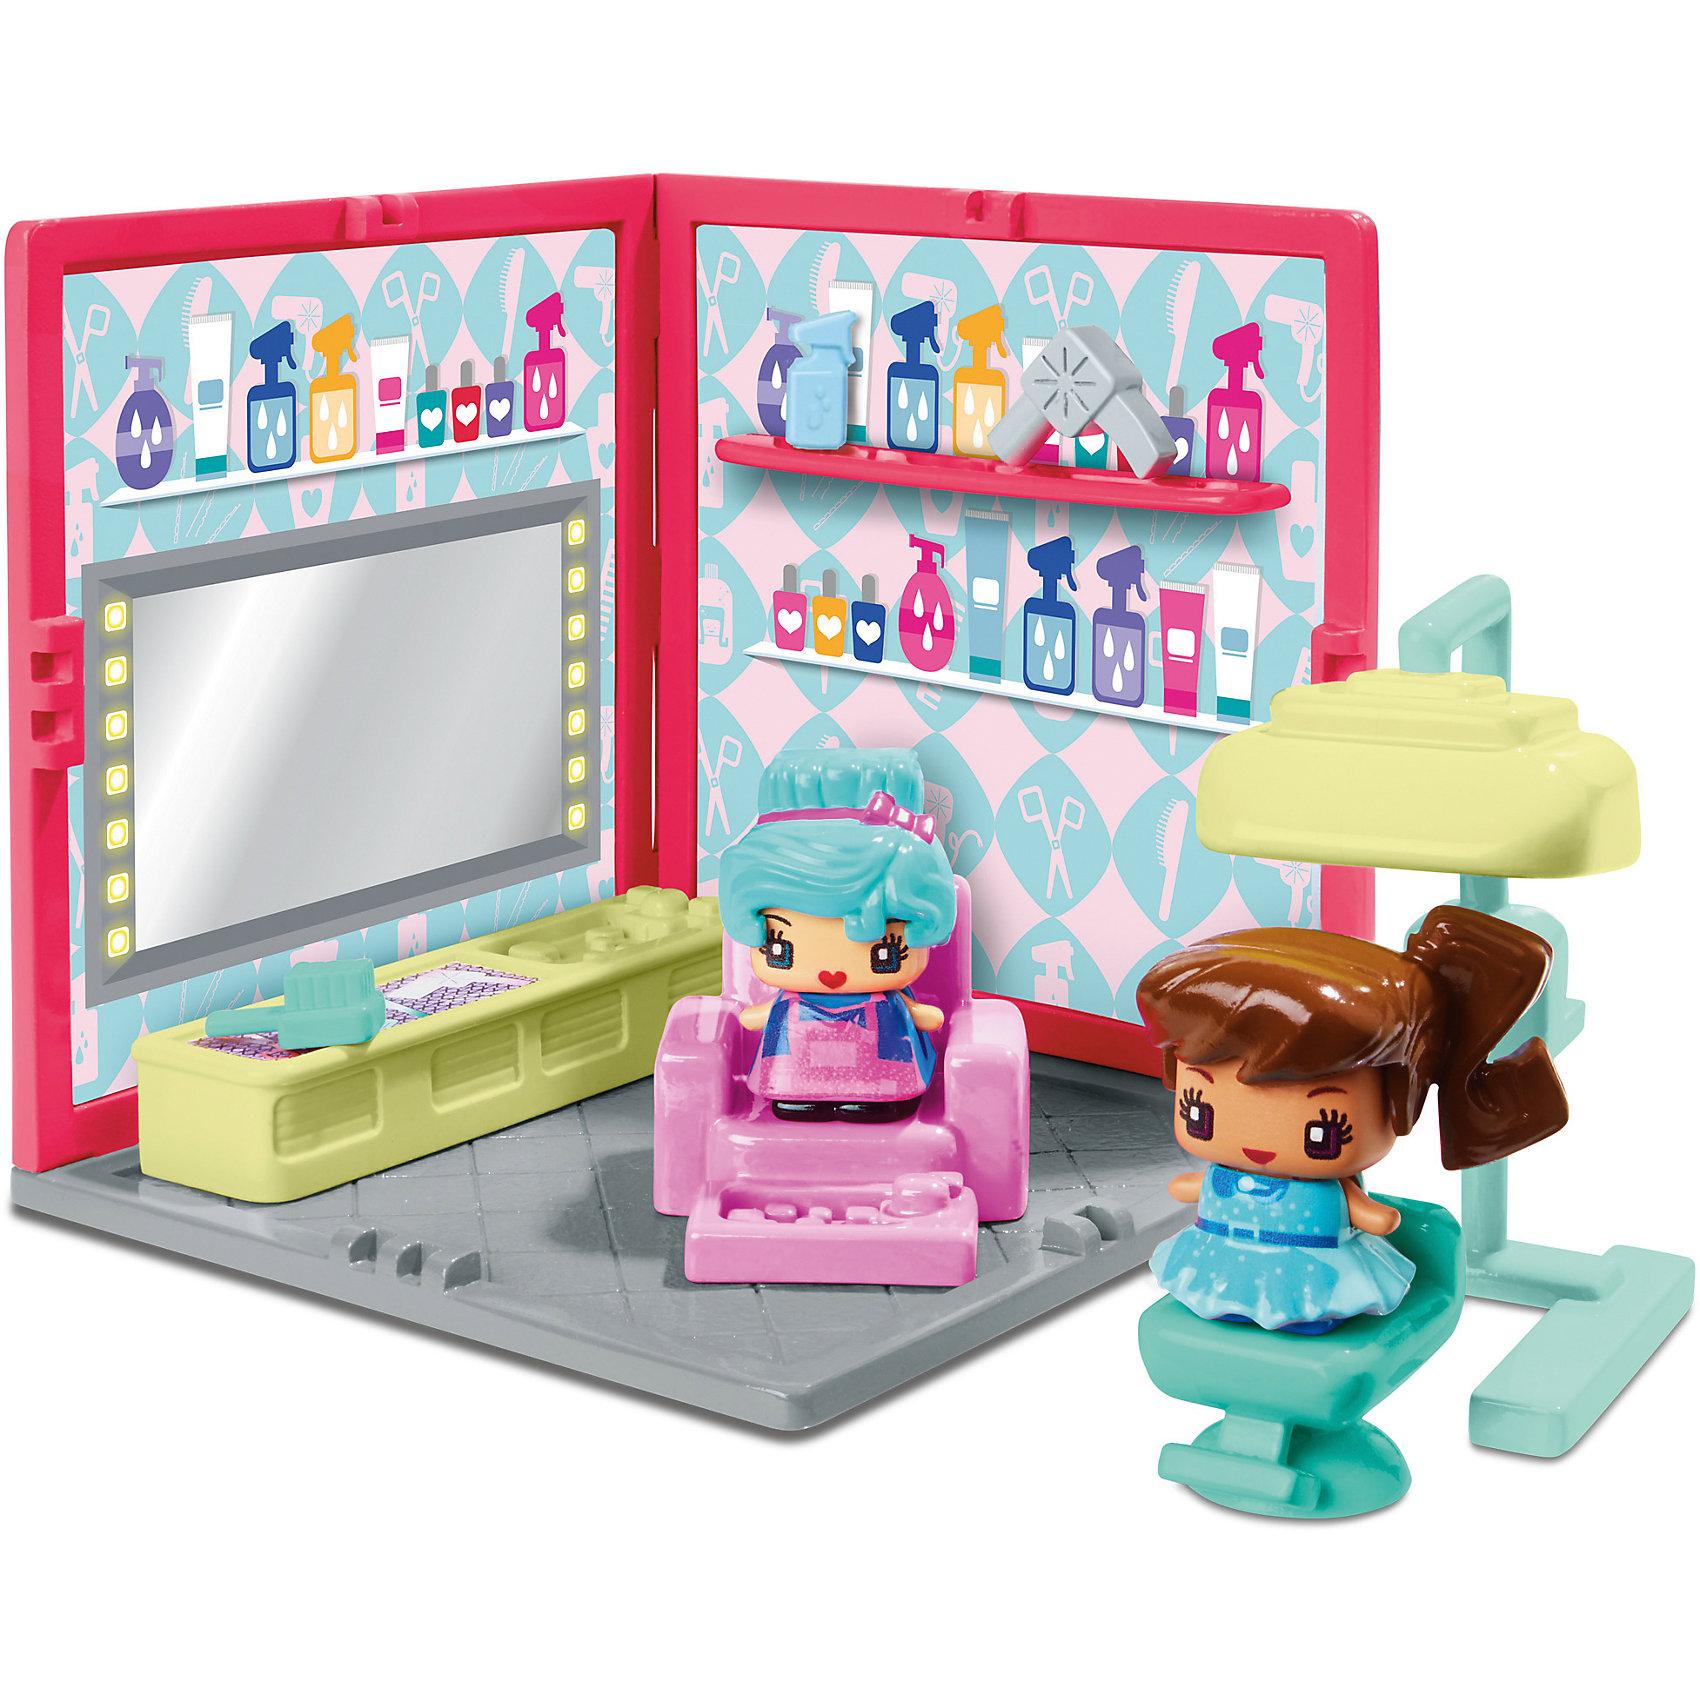 Mattel Мини-комната My Mini MixieQ's mattel mattel кукла ever after high мишель мермейд